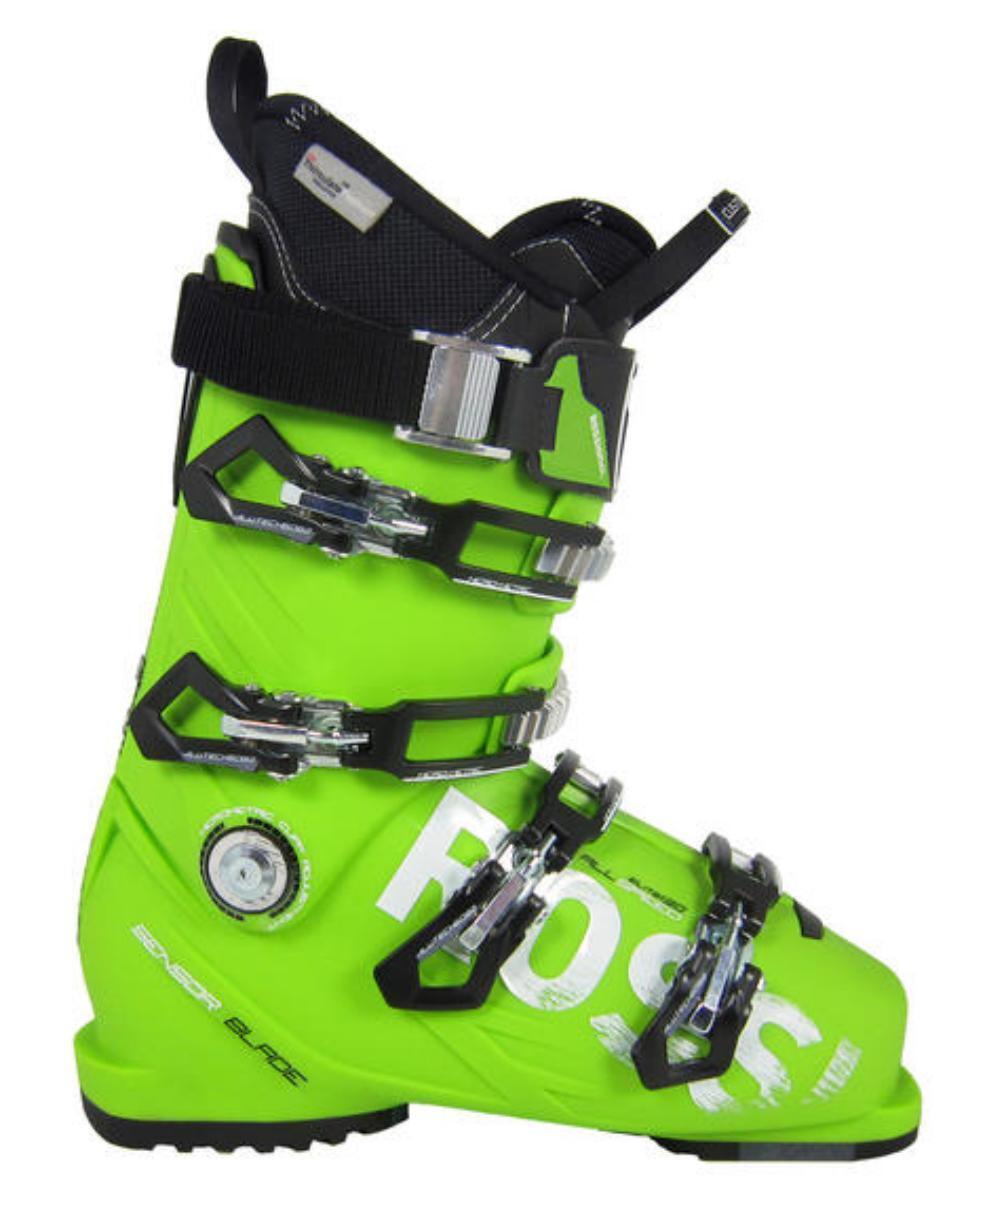 Rossignol 27.5 AllSpeed Elite 130 ski Stiefel 27.5 Rossignol (CLEARANCE PRICE) NEW 9df776